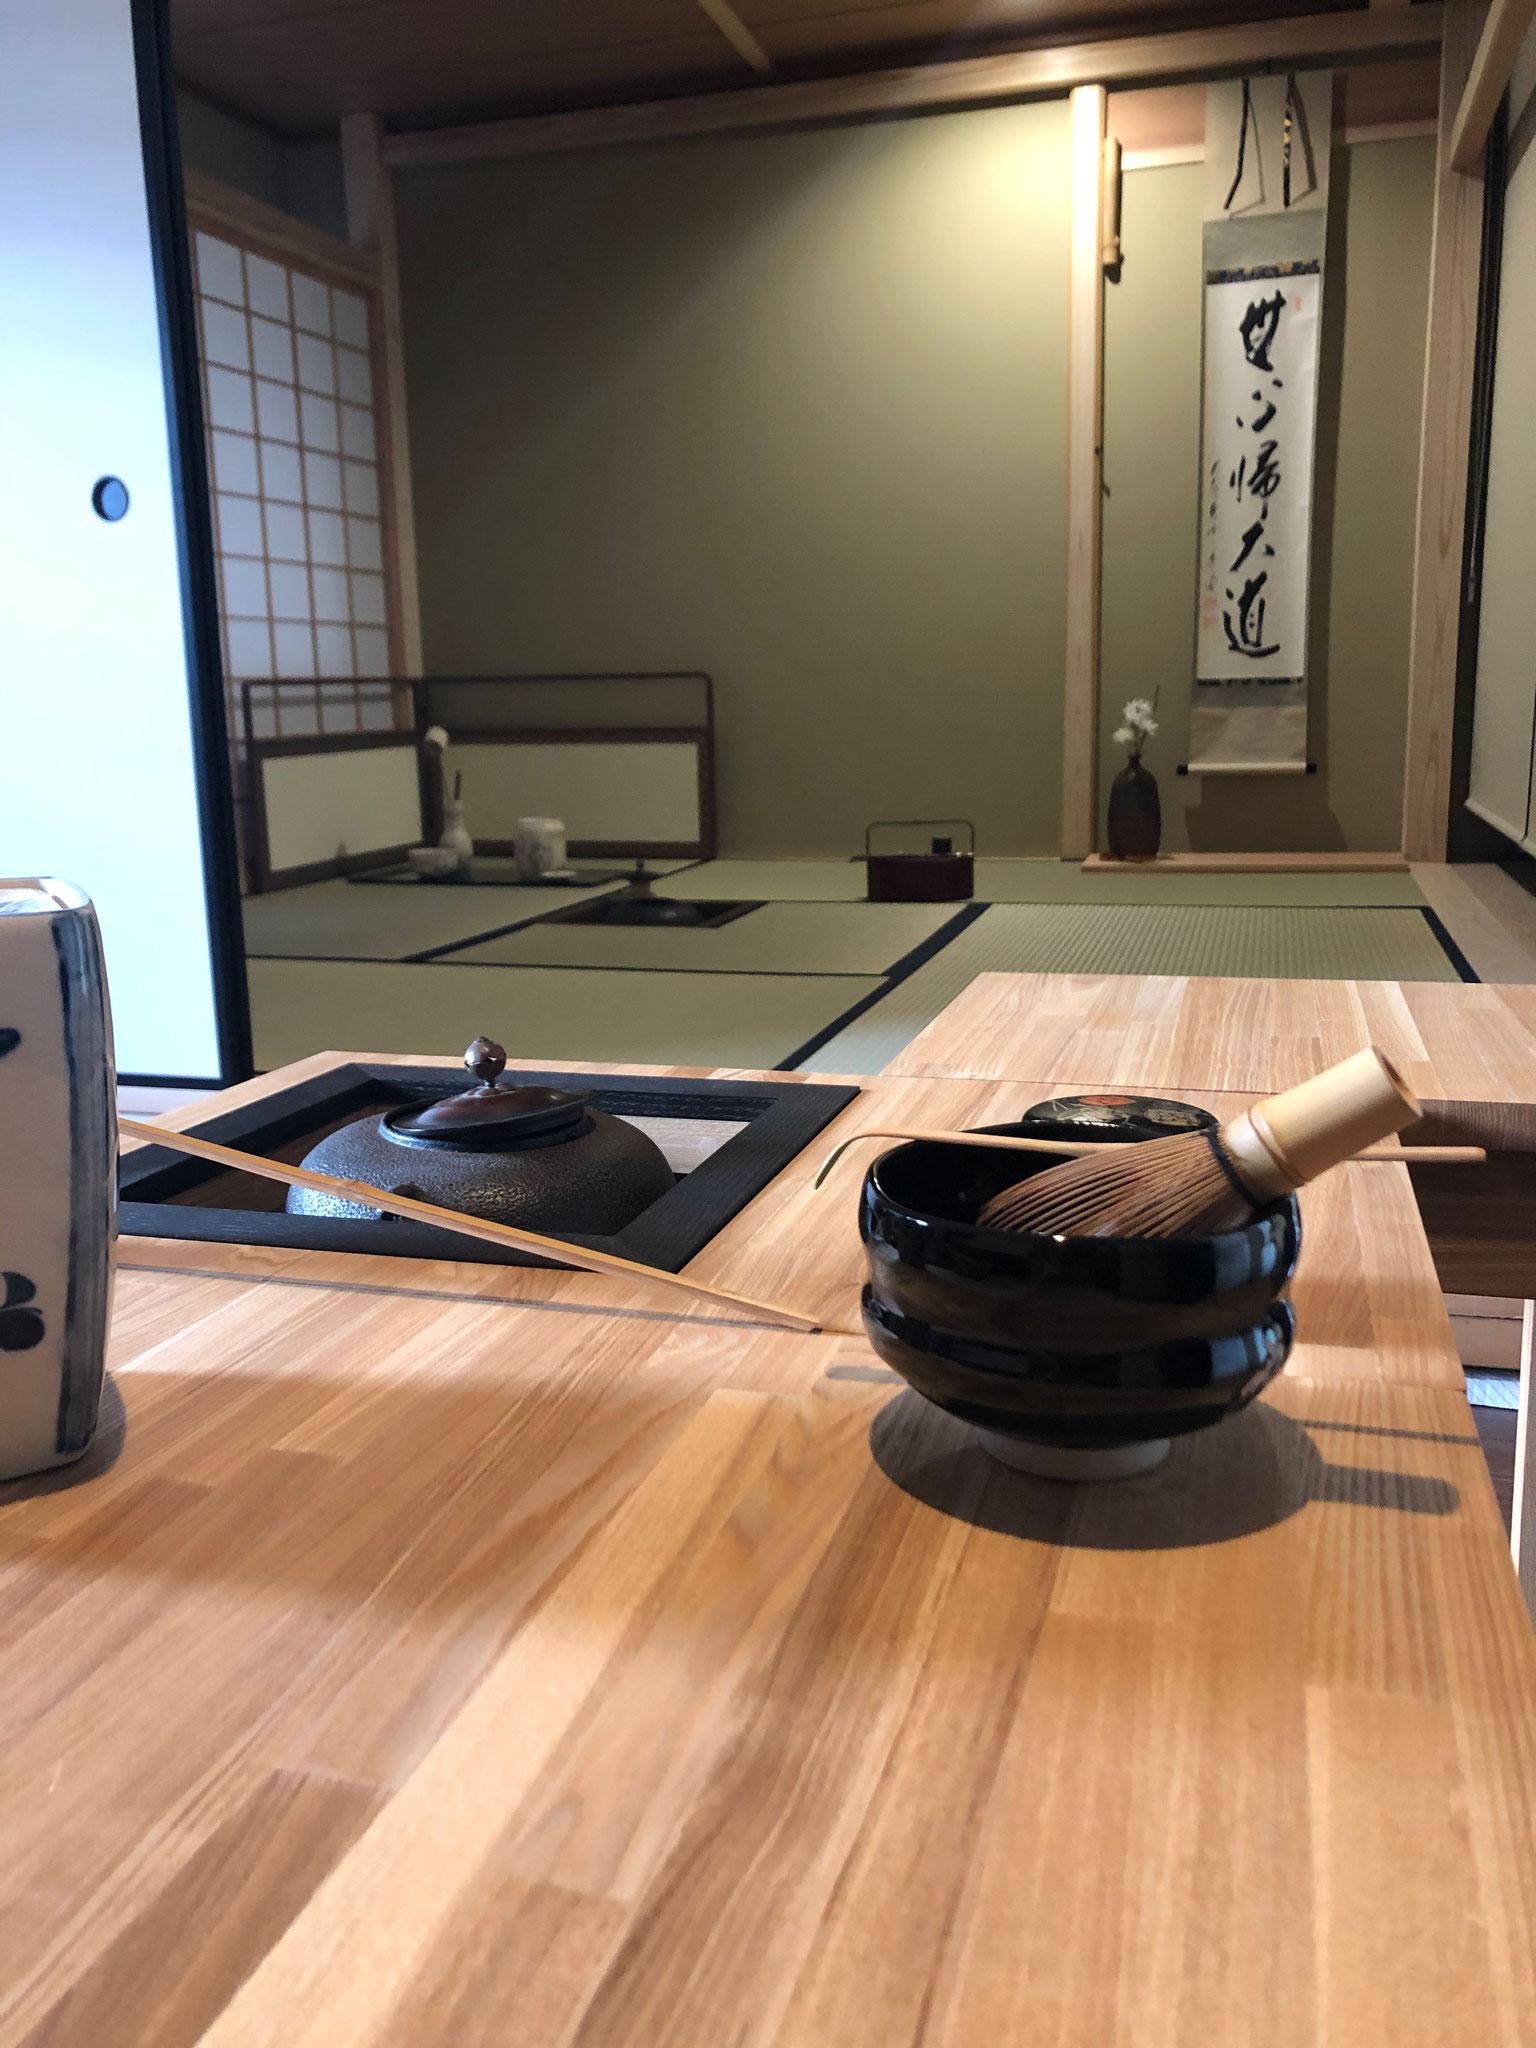 Urasenke Chanoyu:  Clase especial en el estilo moderno